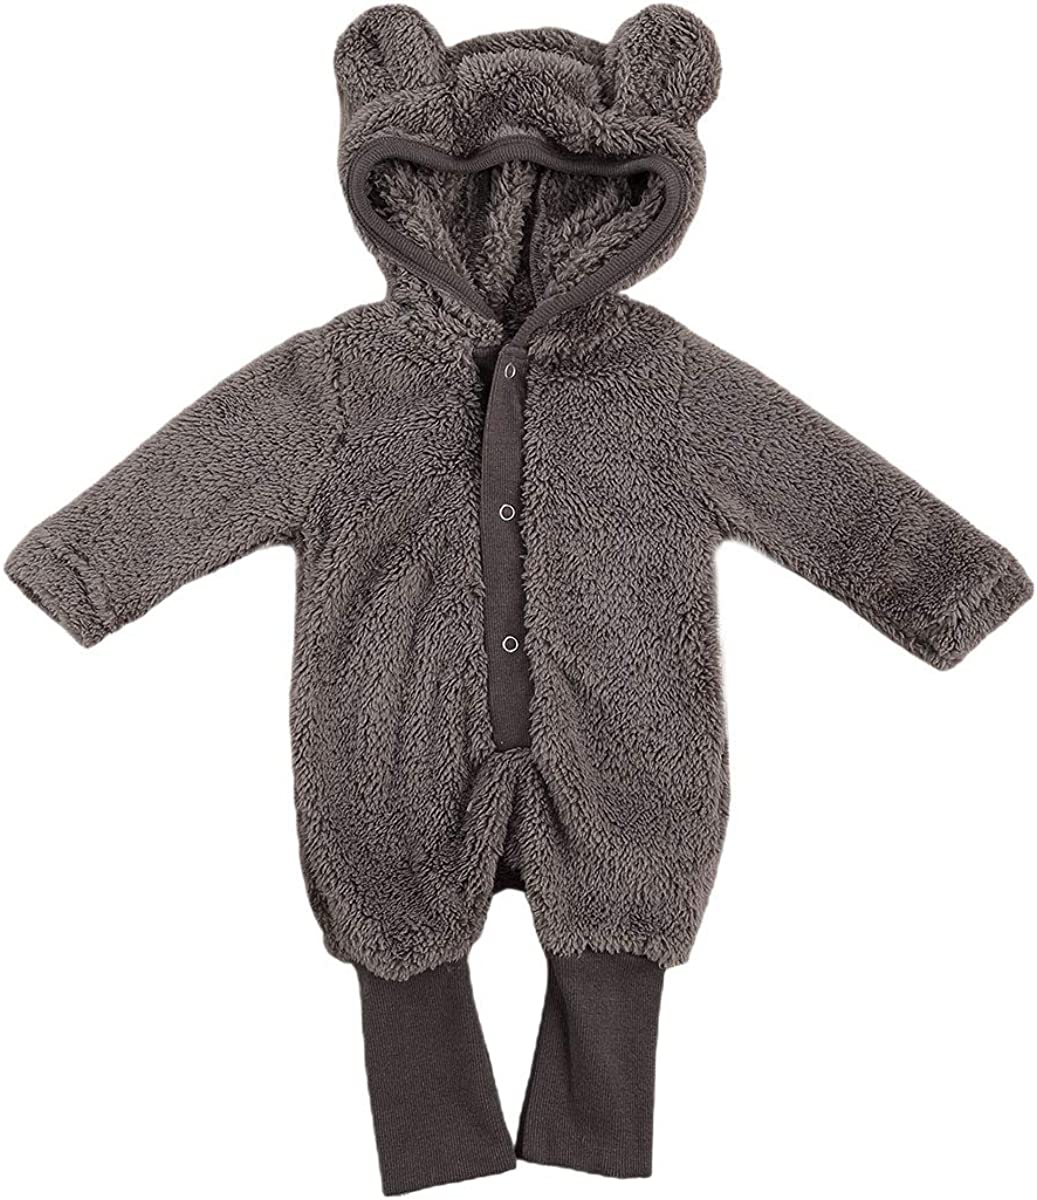 BULINGNA Newborn Baby Boy Girl Bear Hooded Jumpsuit Cotton Fleece Coats Fall Winter Outwear